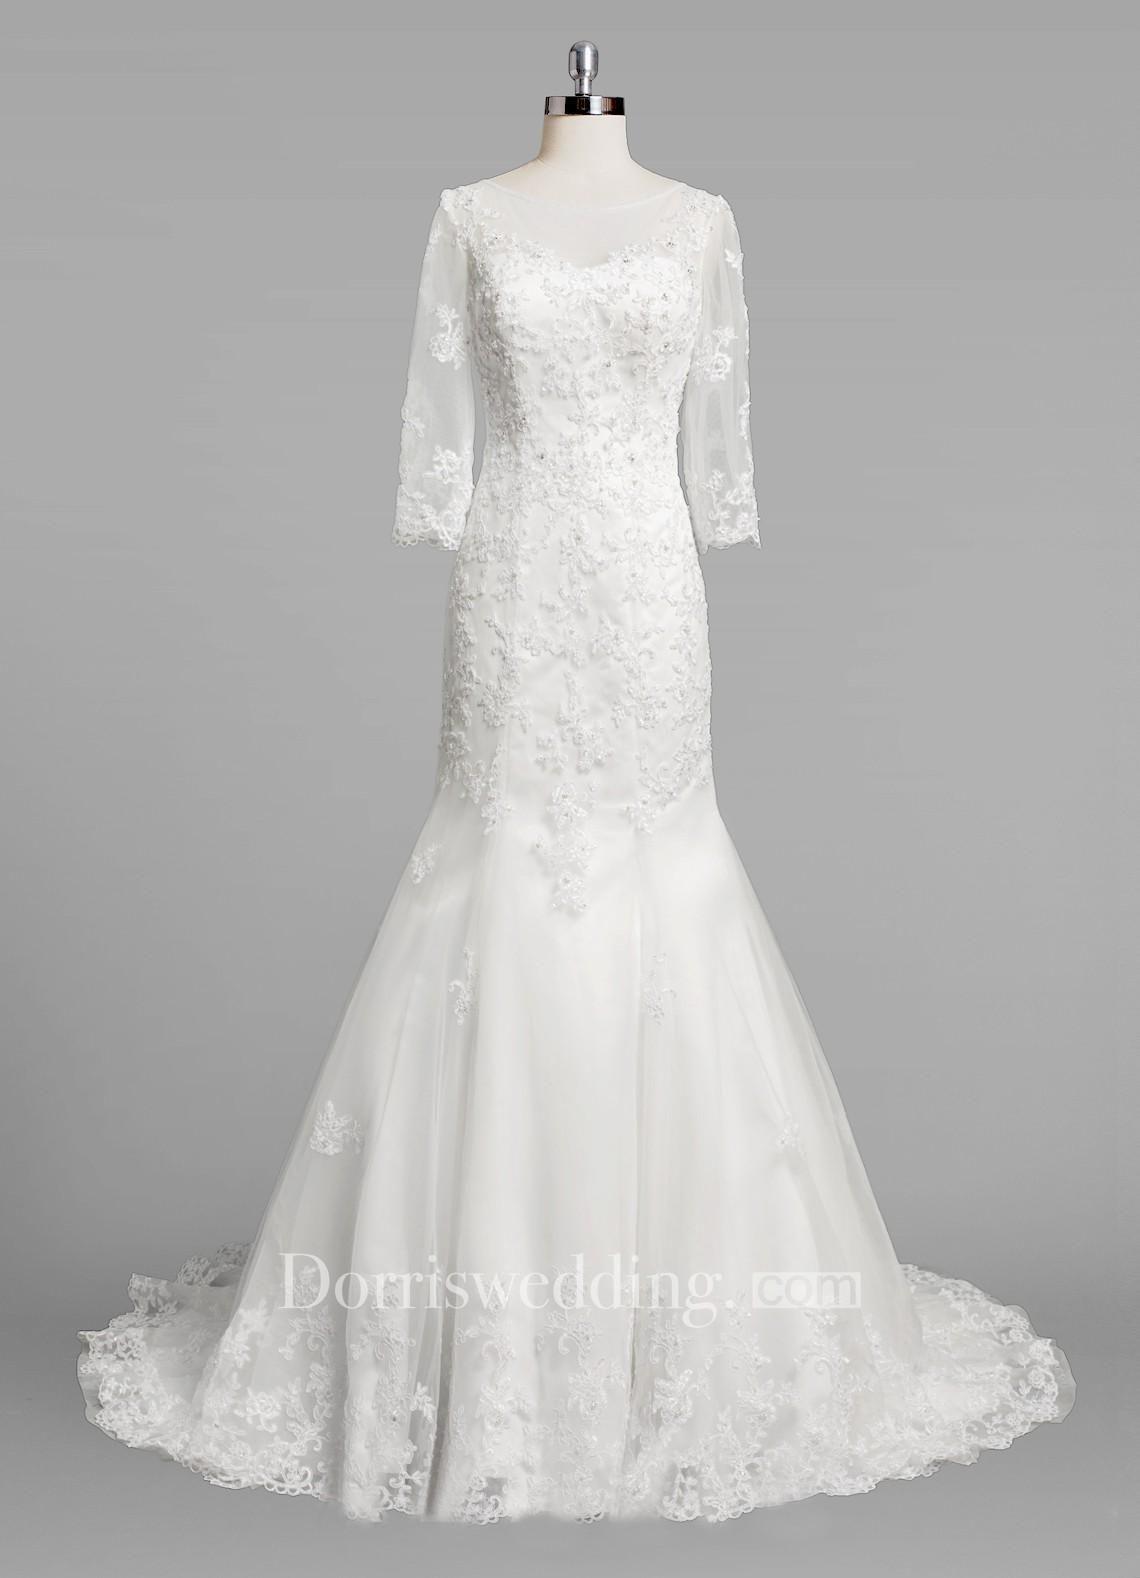 3 4 sleeve lace wedding dress  Valentines AdoreWe Dorris Wedding  Dorris Wedding Bateau Neck